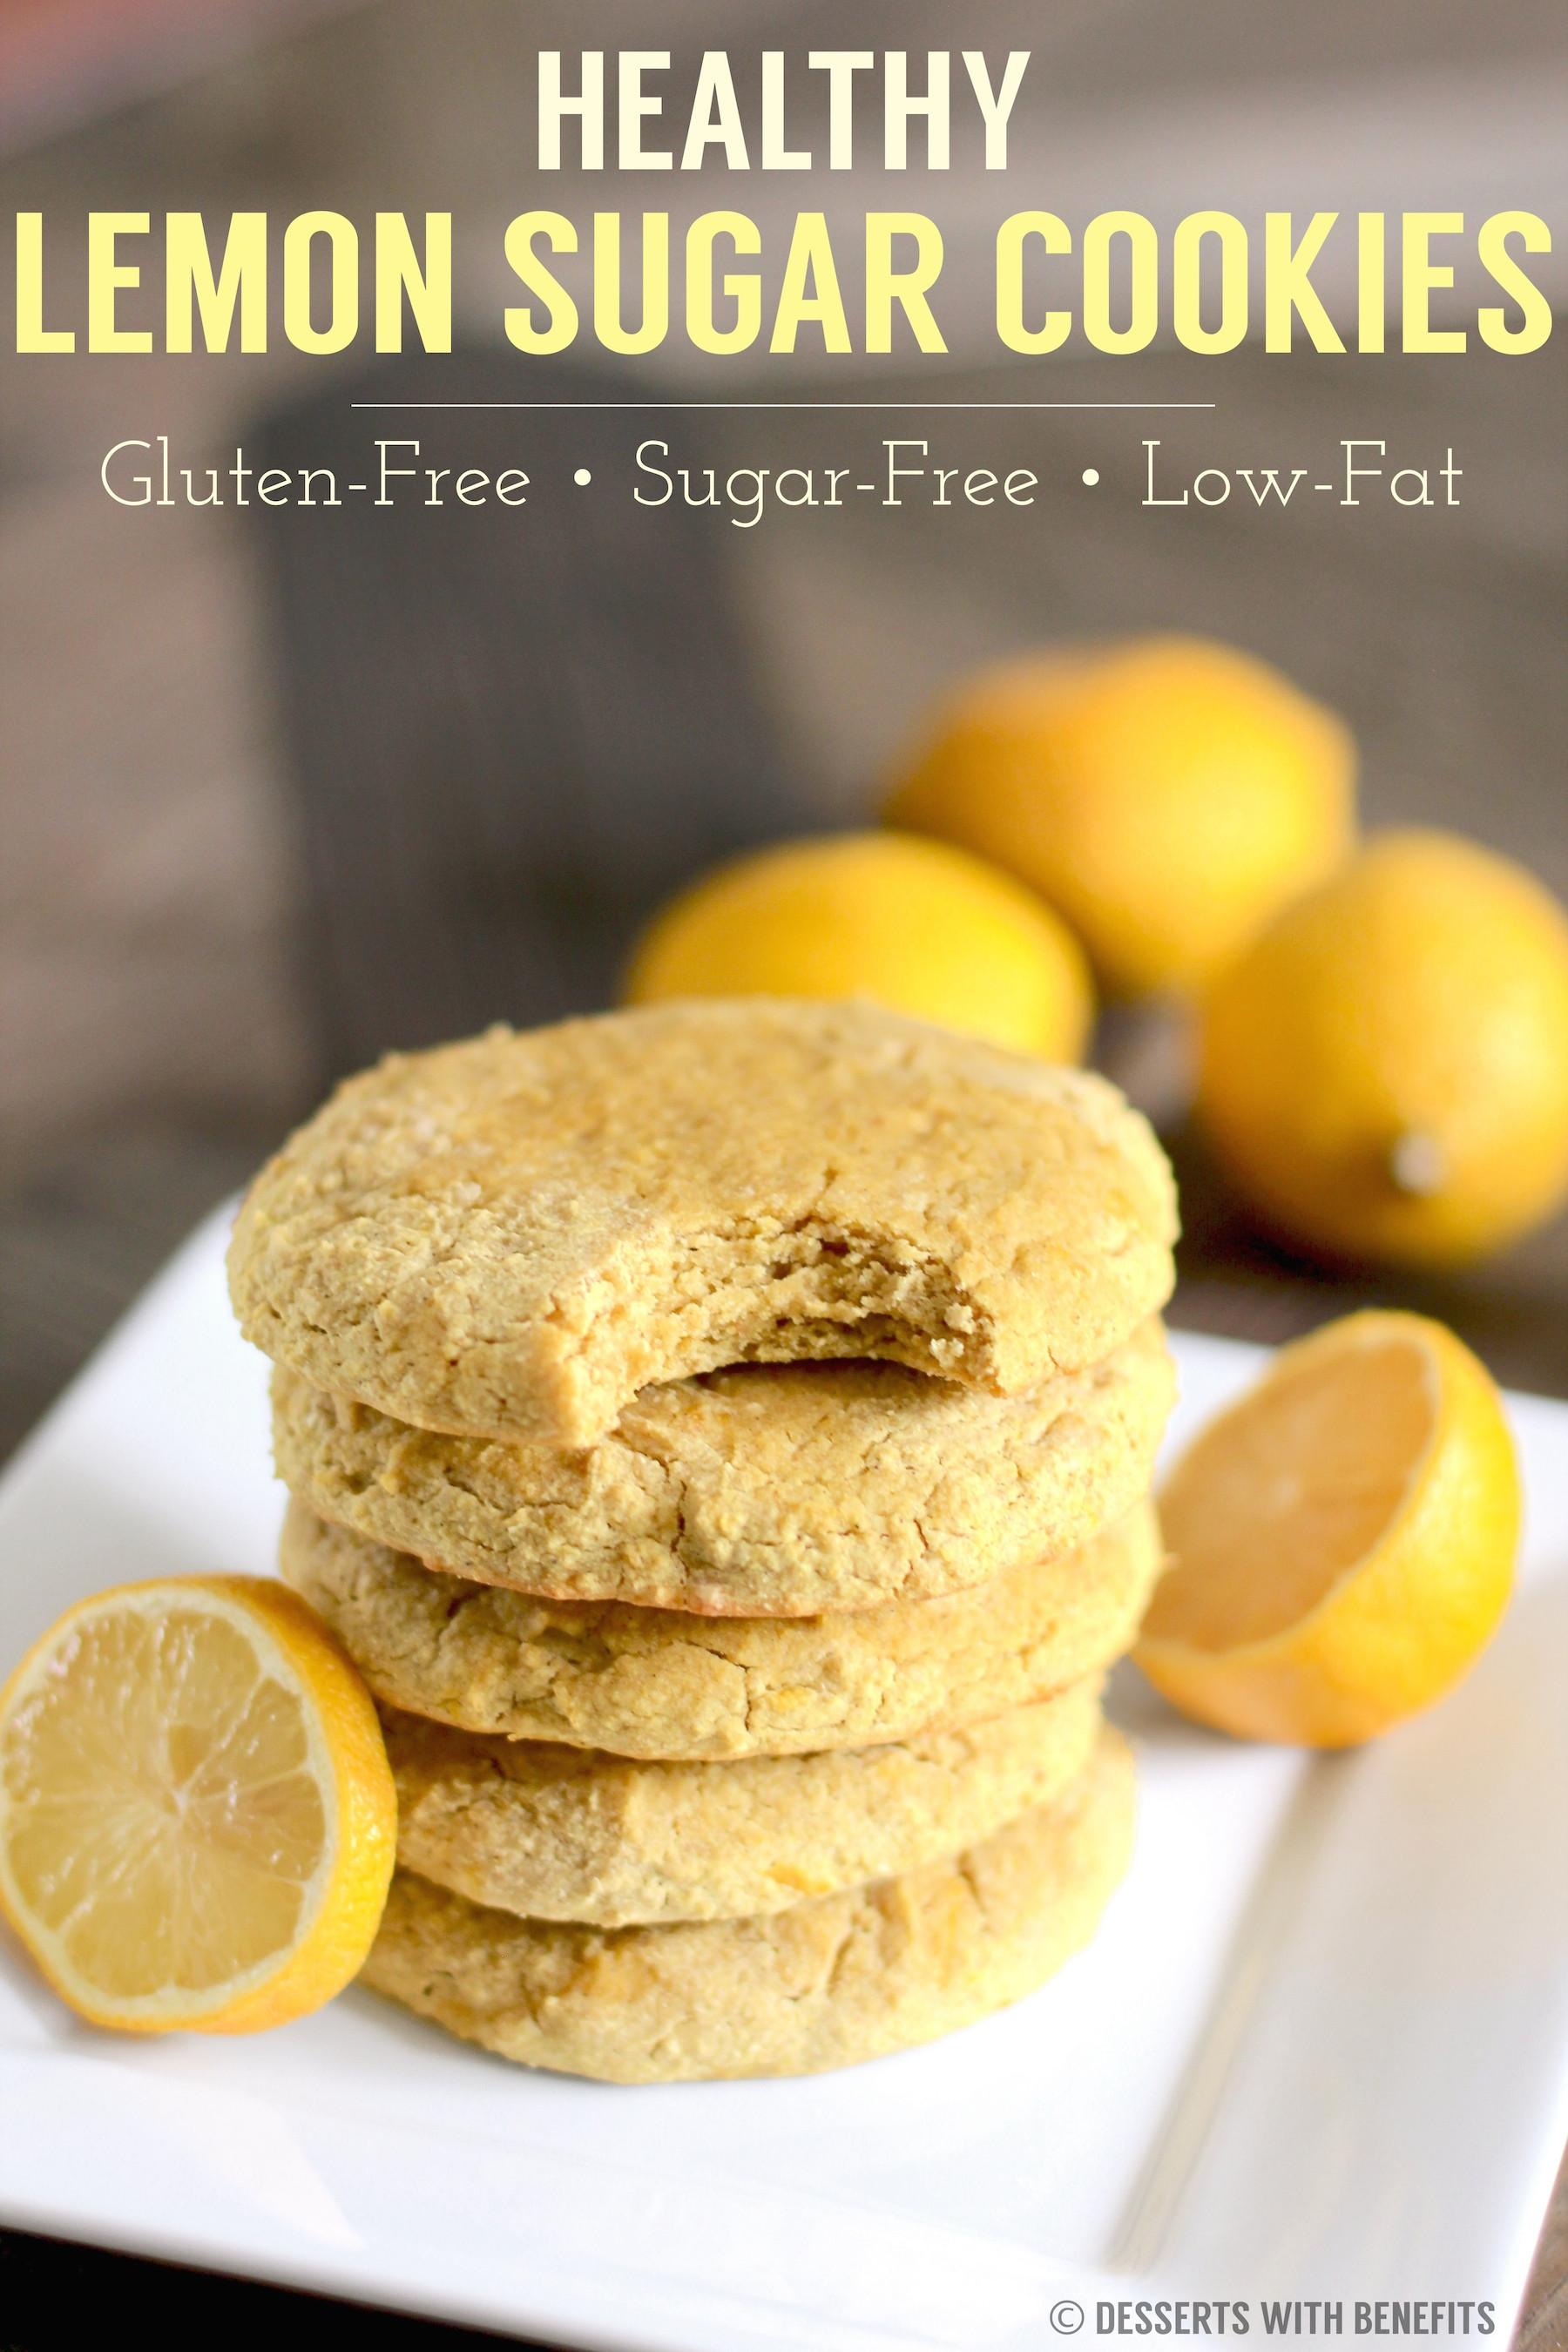 Healthy Lemon Dessert Recipes  Healthy Gluten Free Lemon Sugar Cookies Recipe